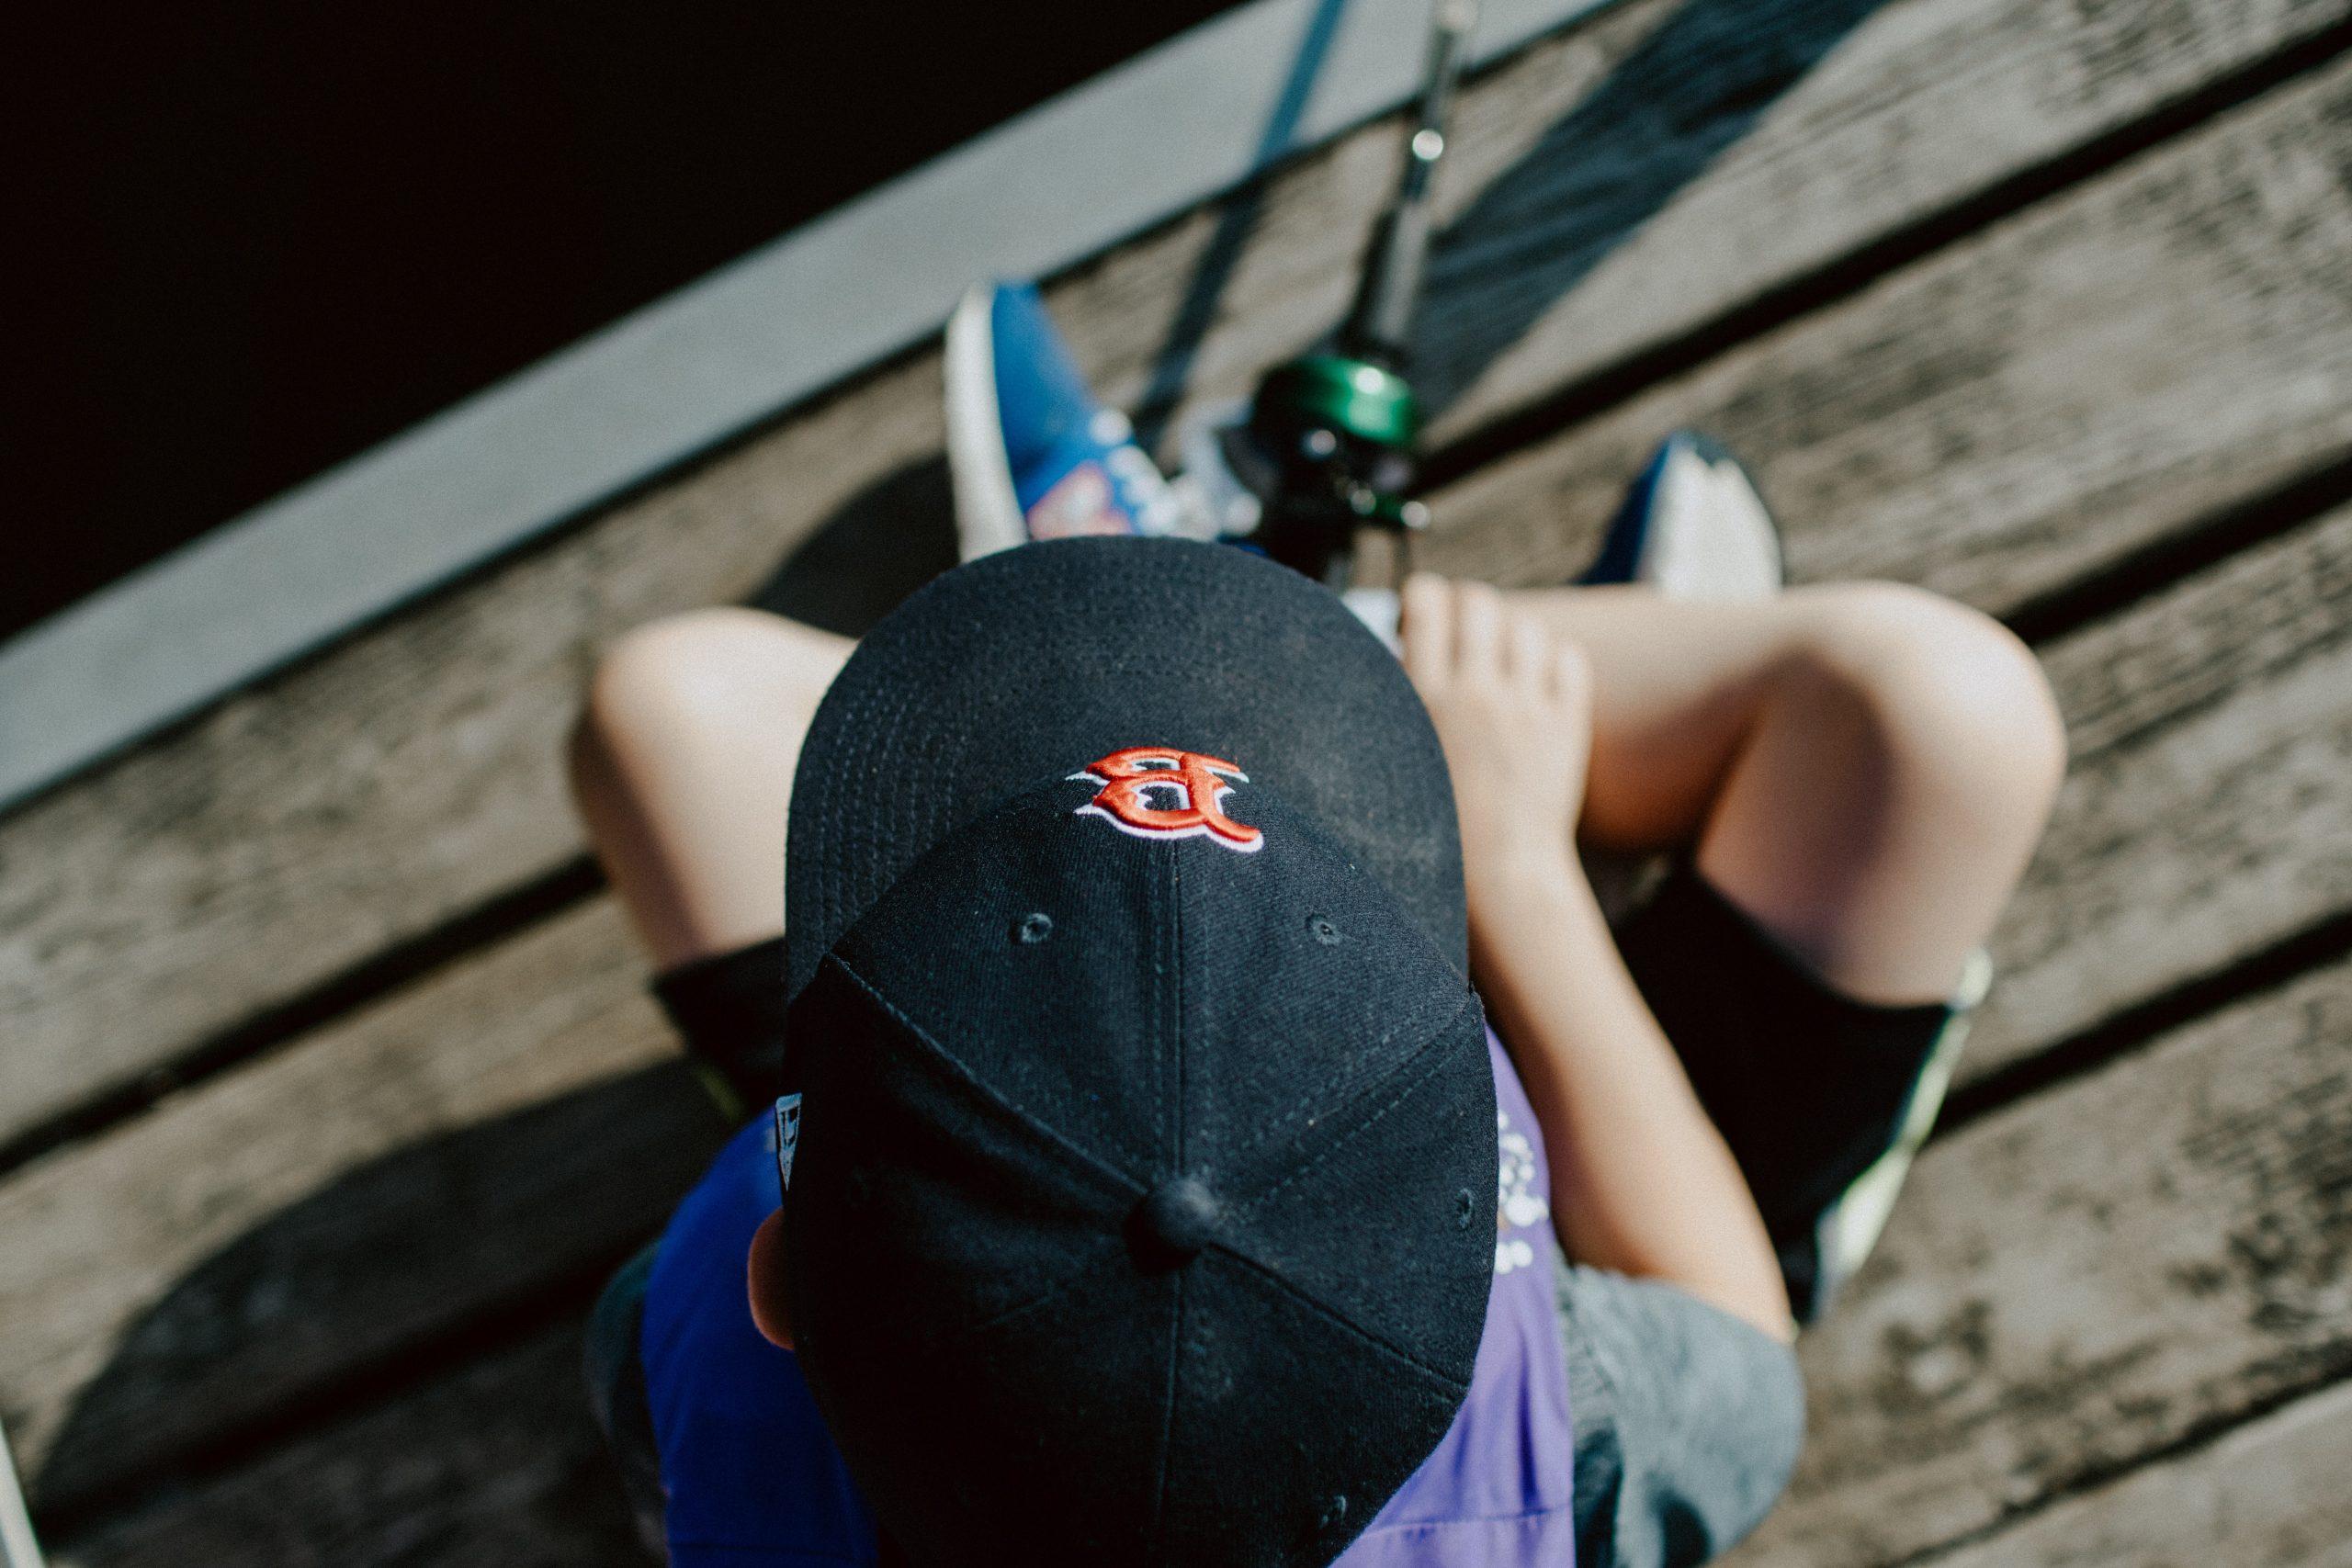 pic of boy fishing by kelly sikkema on Unsplash